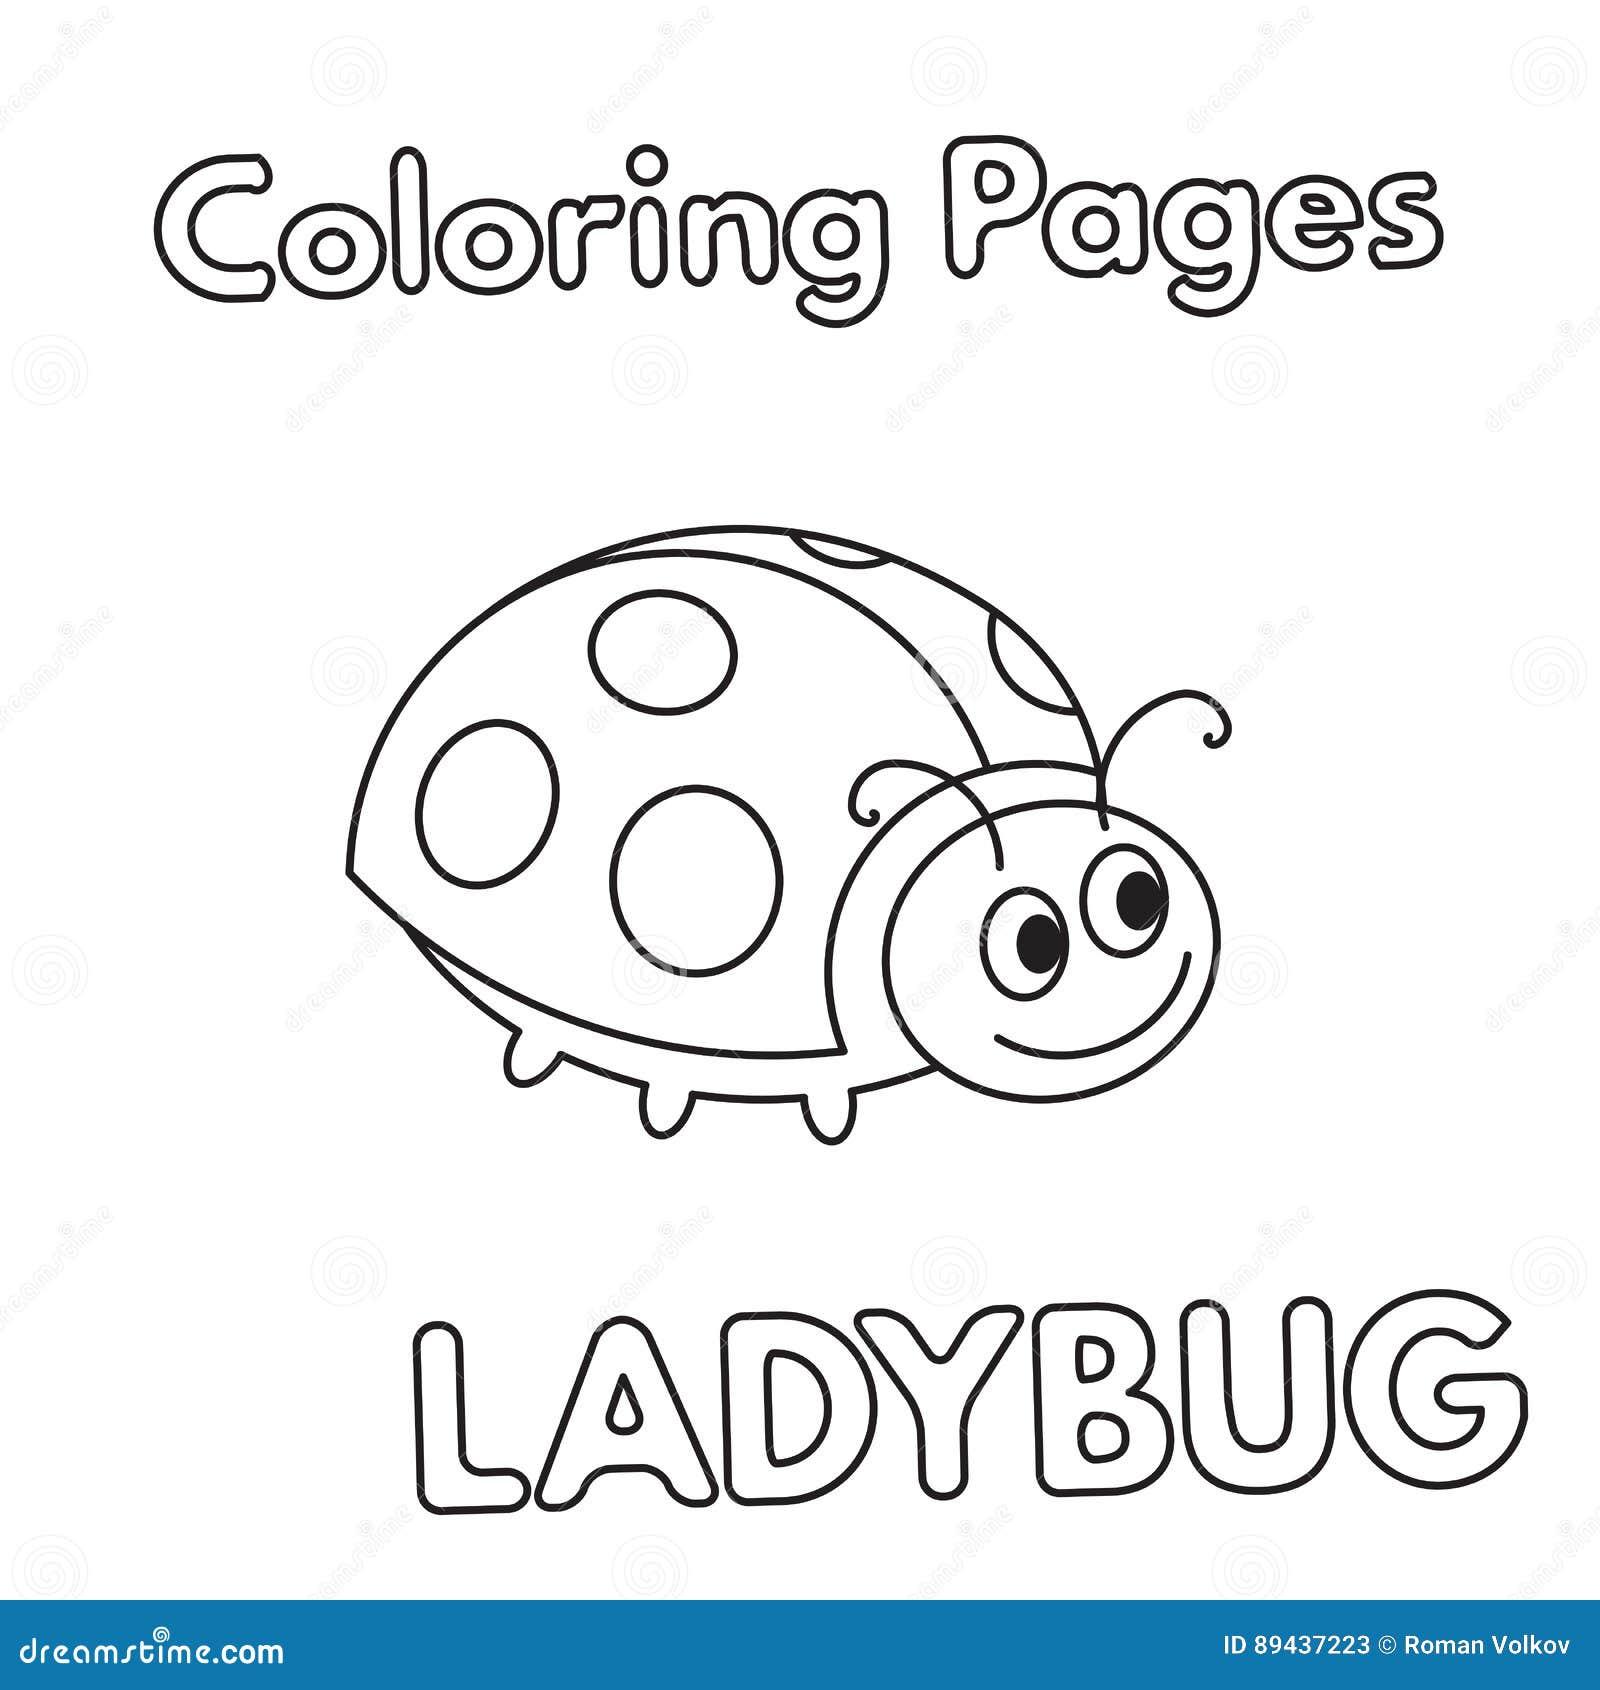 Cartoon Ladybug Coloring Book Stock Vector - Illustration of ...